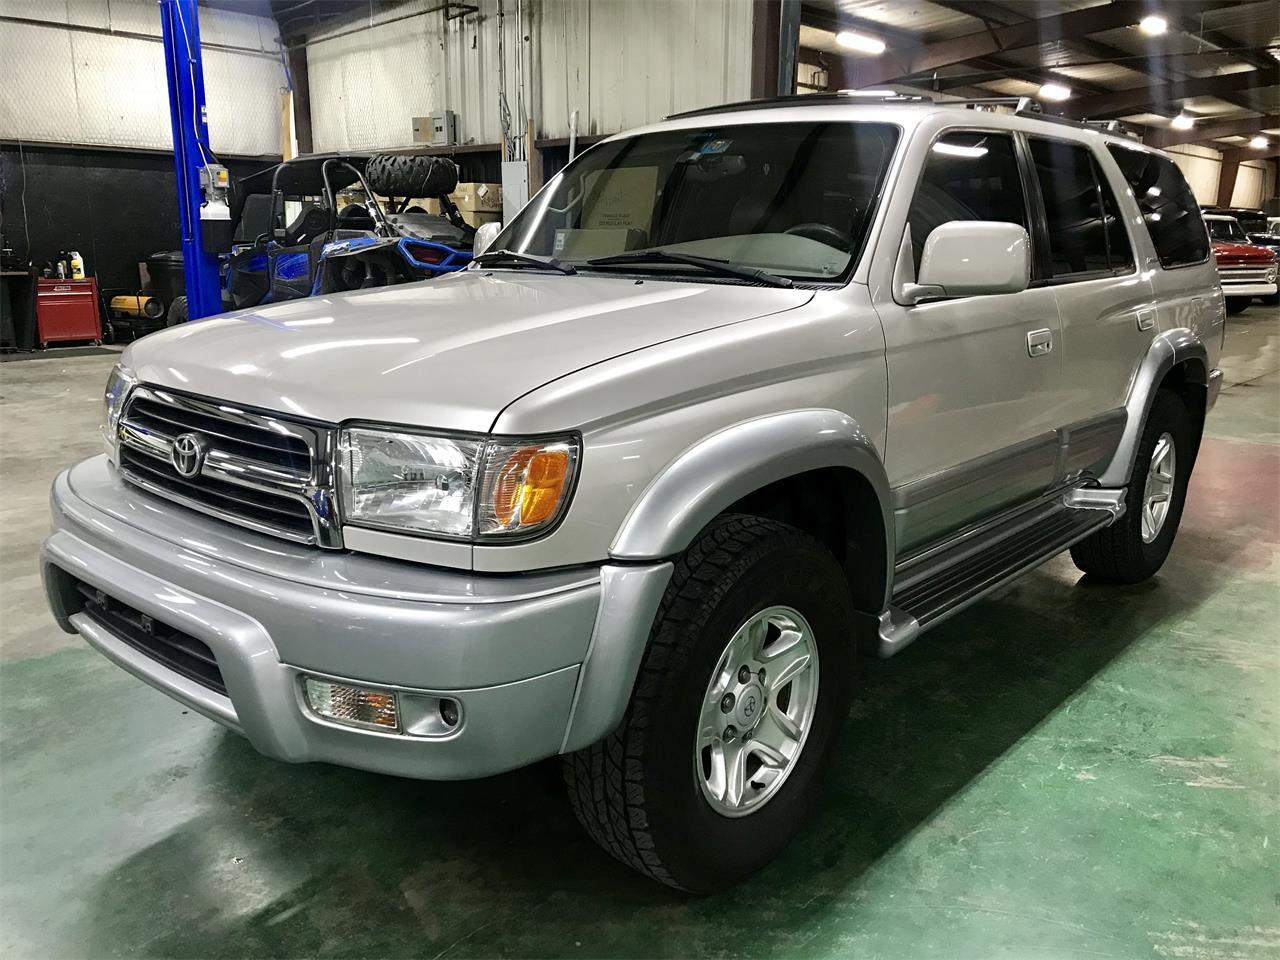 1999 Toyotum 4runner Limited - 1999 toyota 4runner for sale